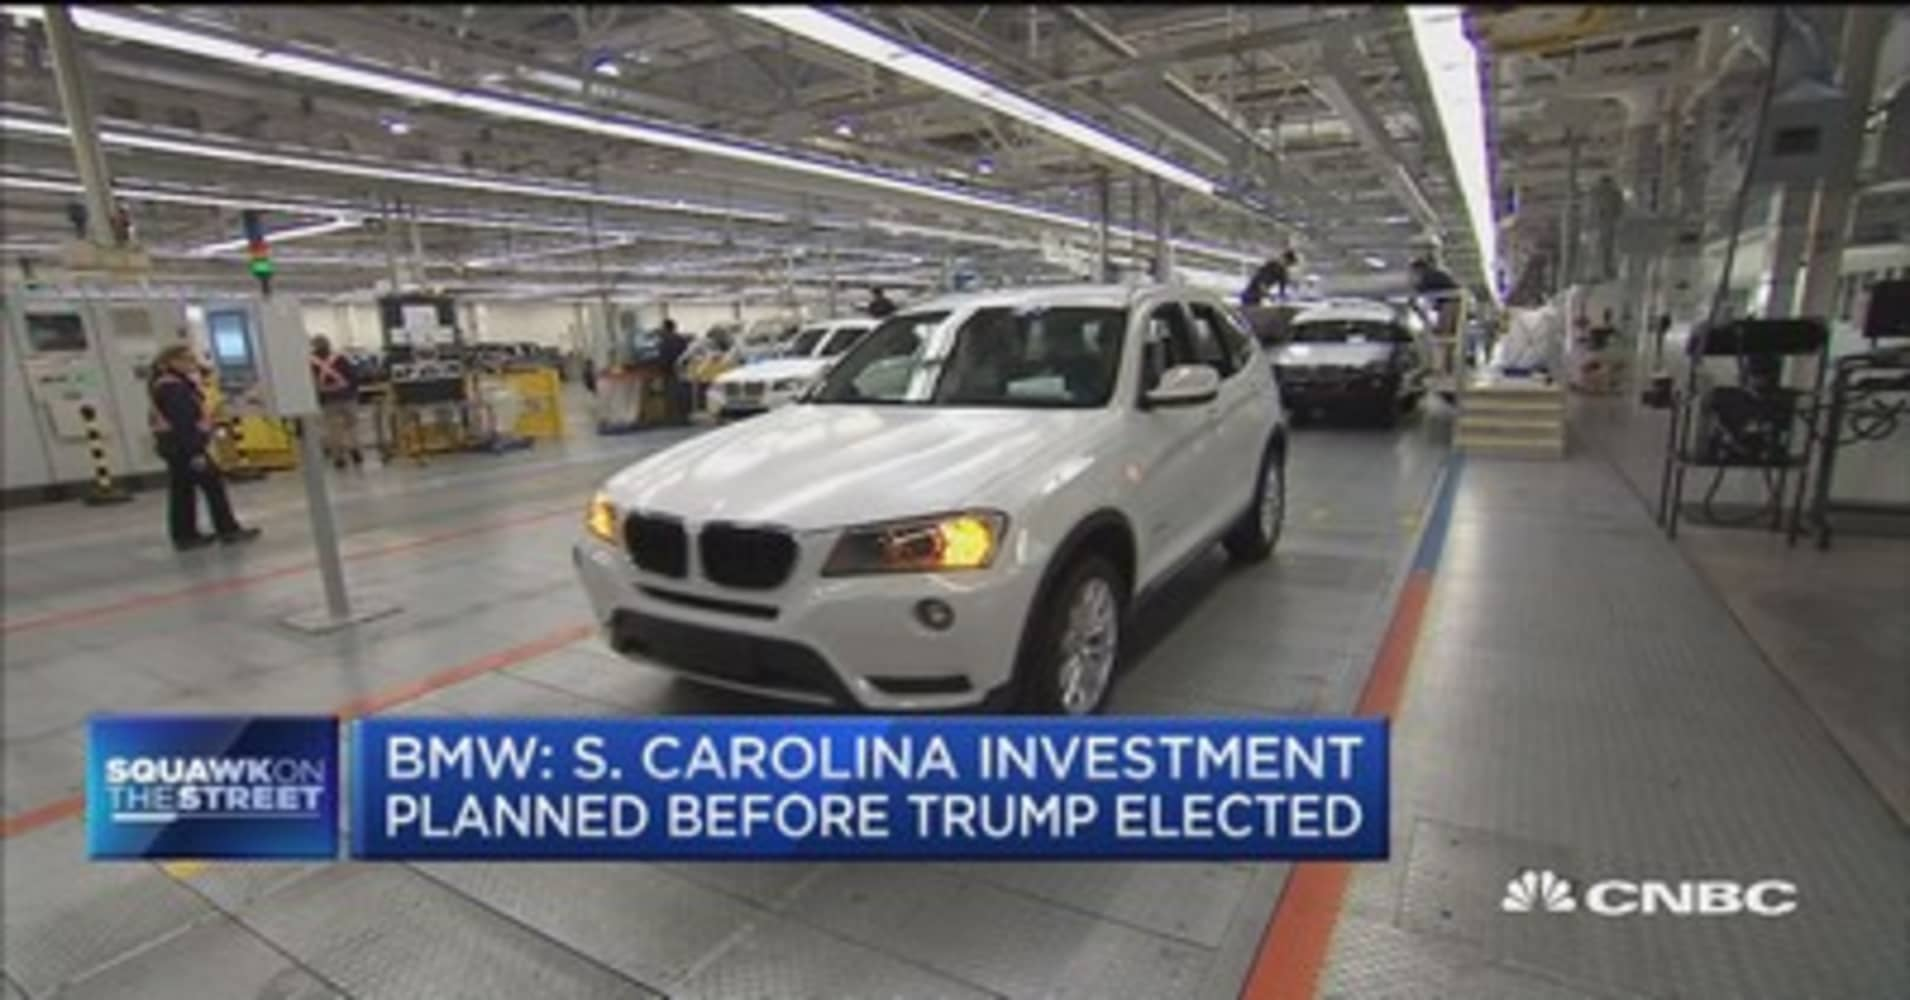 Bmw adding 1 000 jobs at south carolina plant